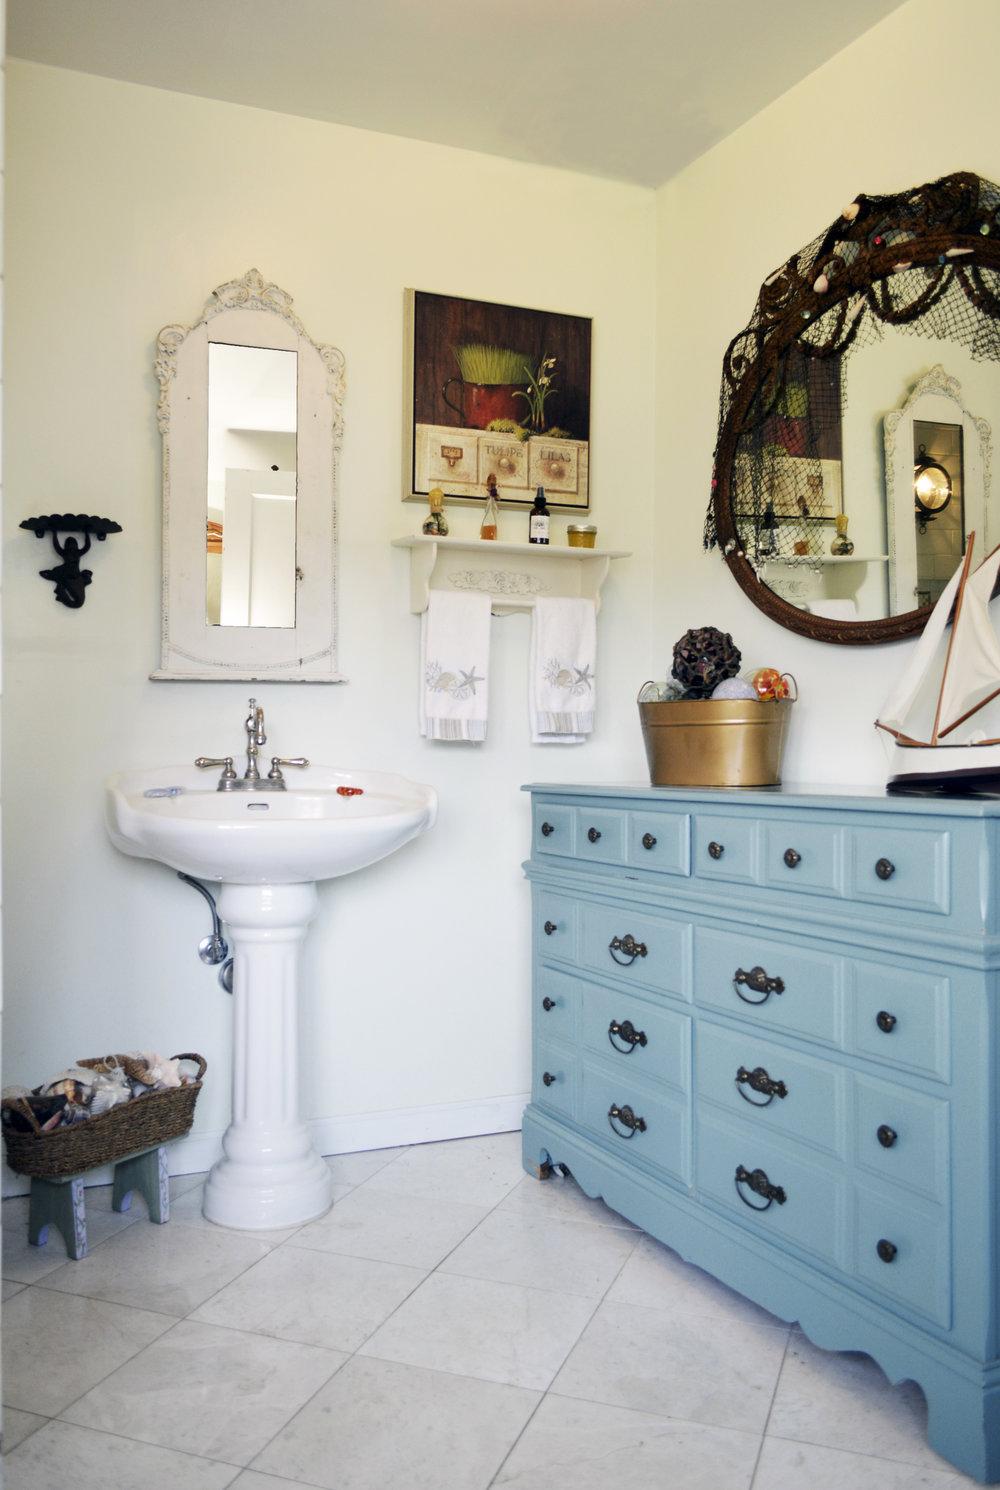 Tree Frog Kitchen & Bath Design — Cottage Style Bathroom